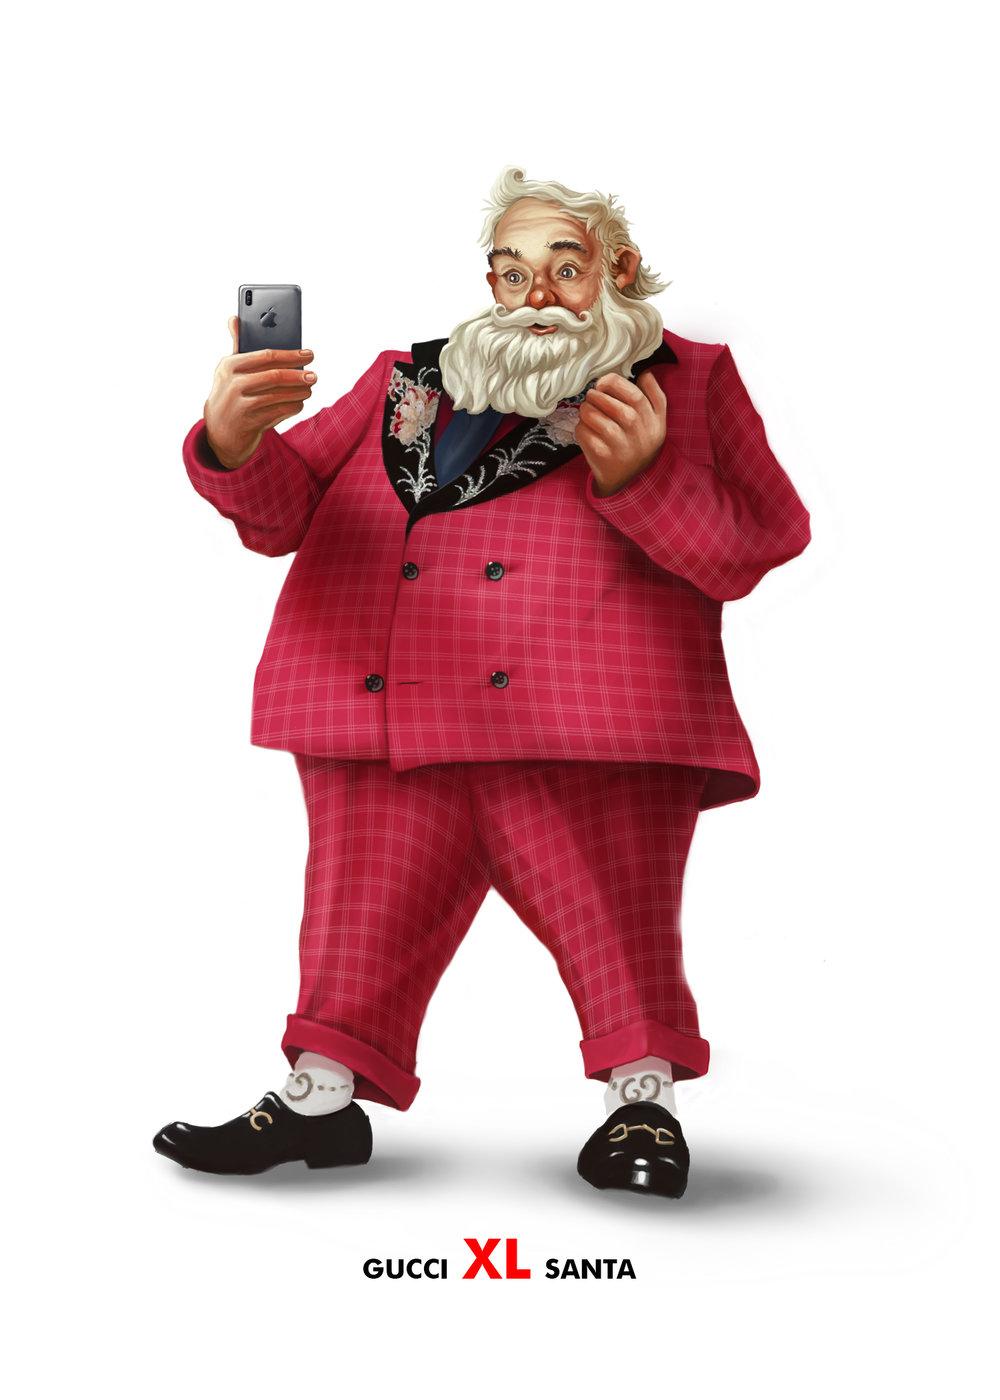 Gucci XL Santa.jpg